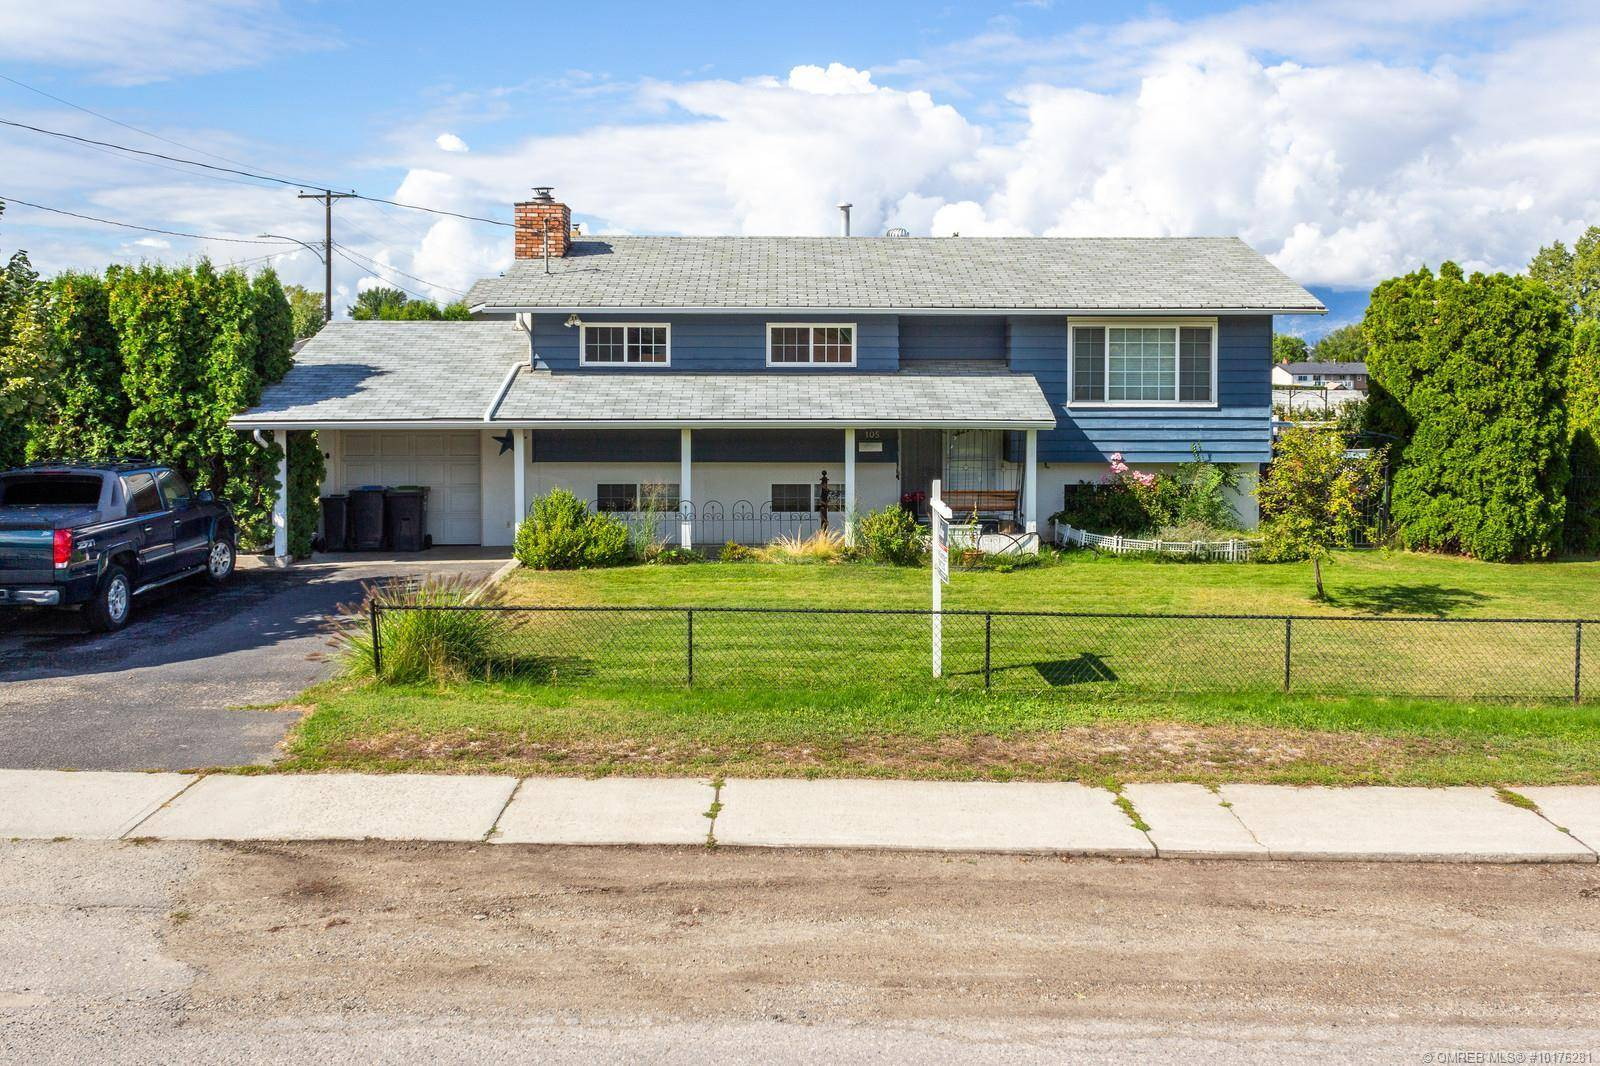 House for sale at 105 Adventure Rd Kelowna British Columbia - MLS: 10176281